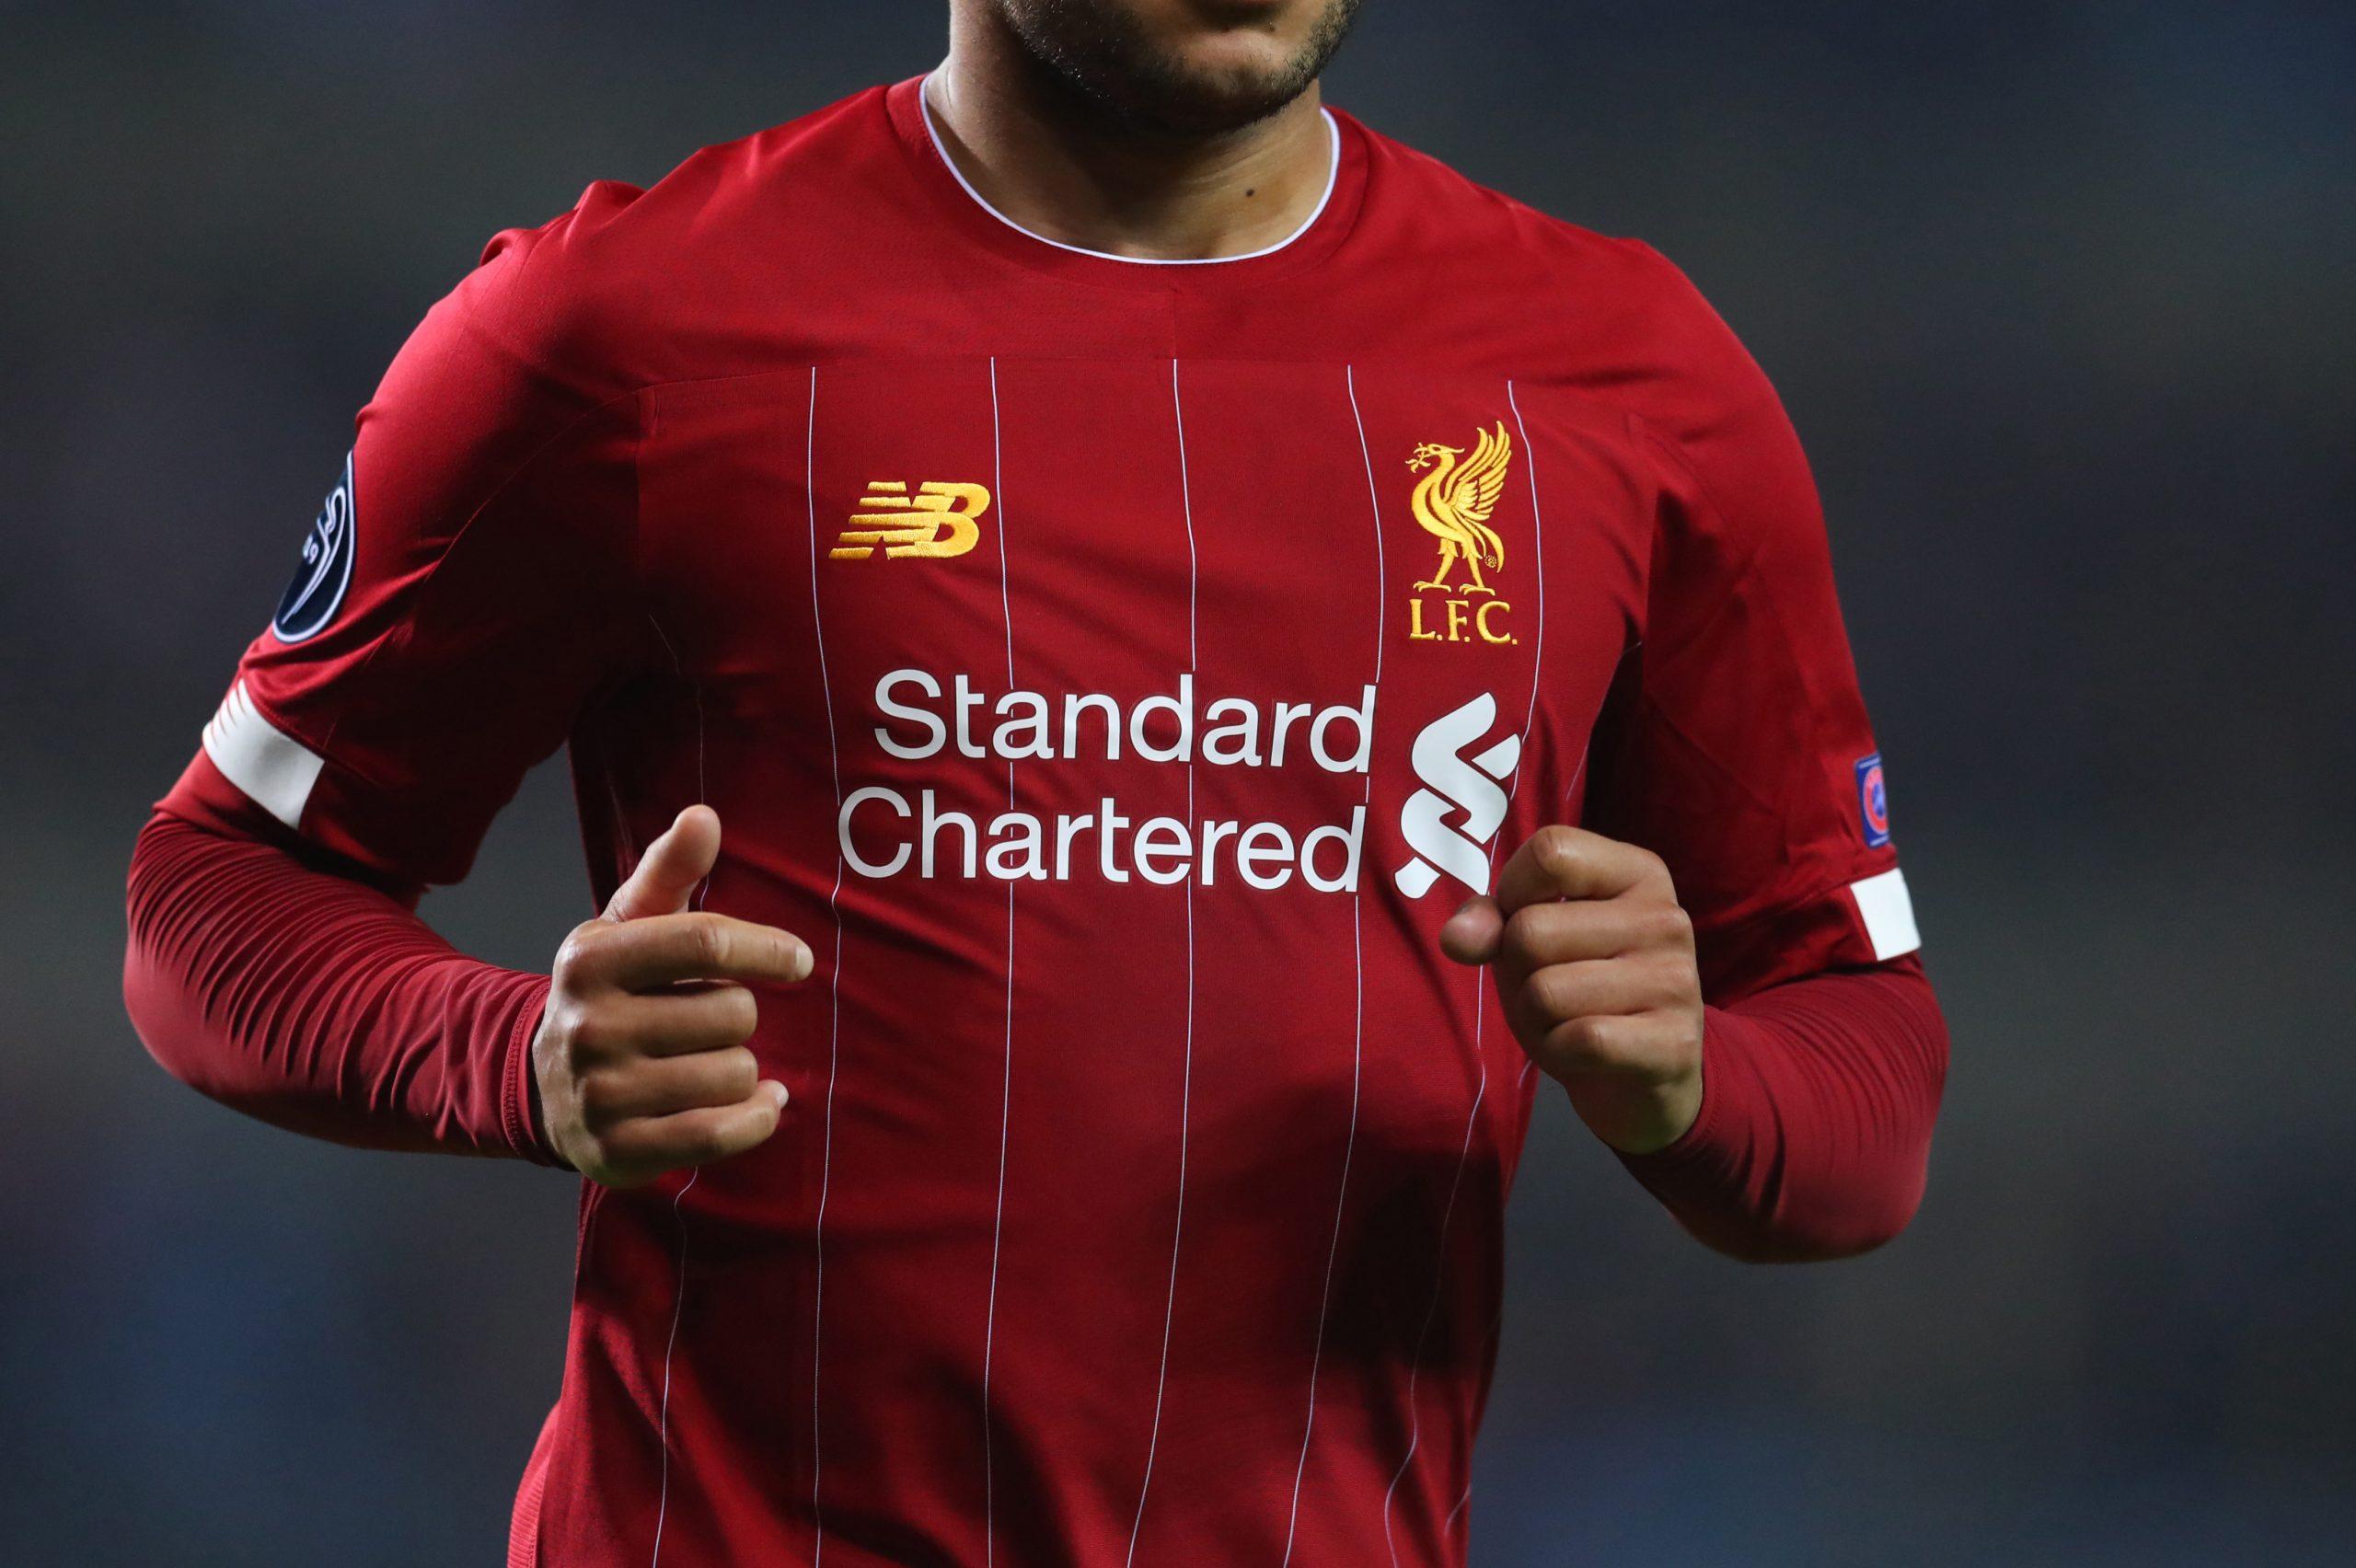 Maillot Liverpool FC sponsor Standard Chartered